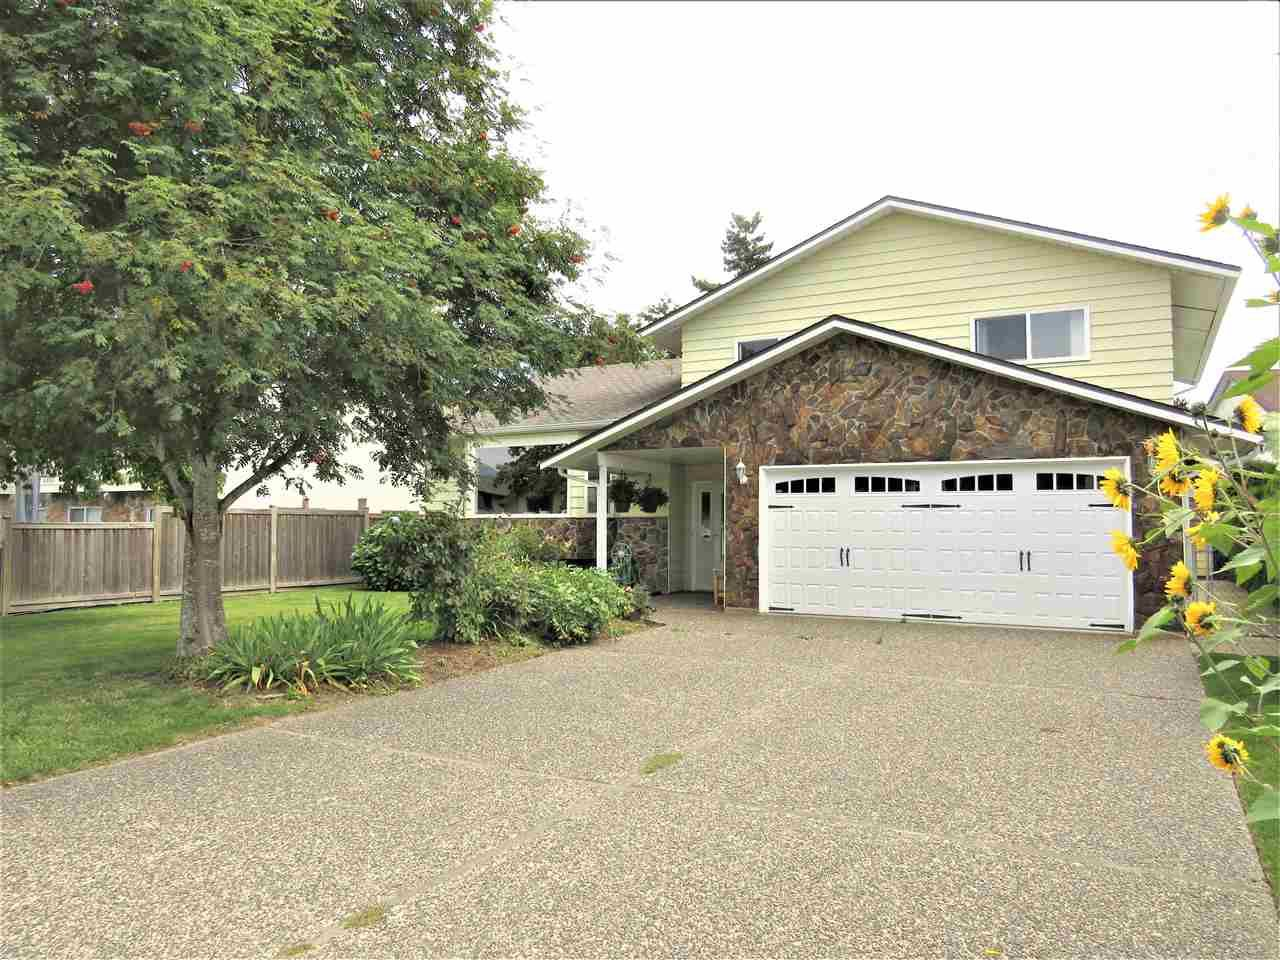 Main Photo: 6482 WILTSHIRE Street in Sardis: Sardis West Vedder Rd House for sale : MLS®# R2389613